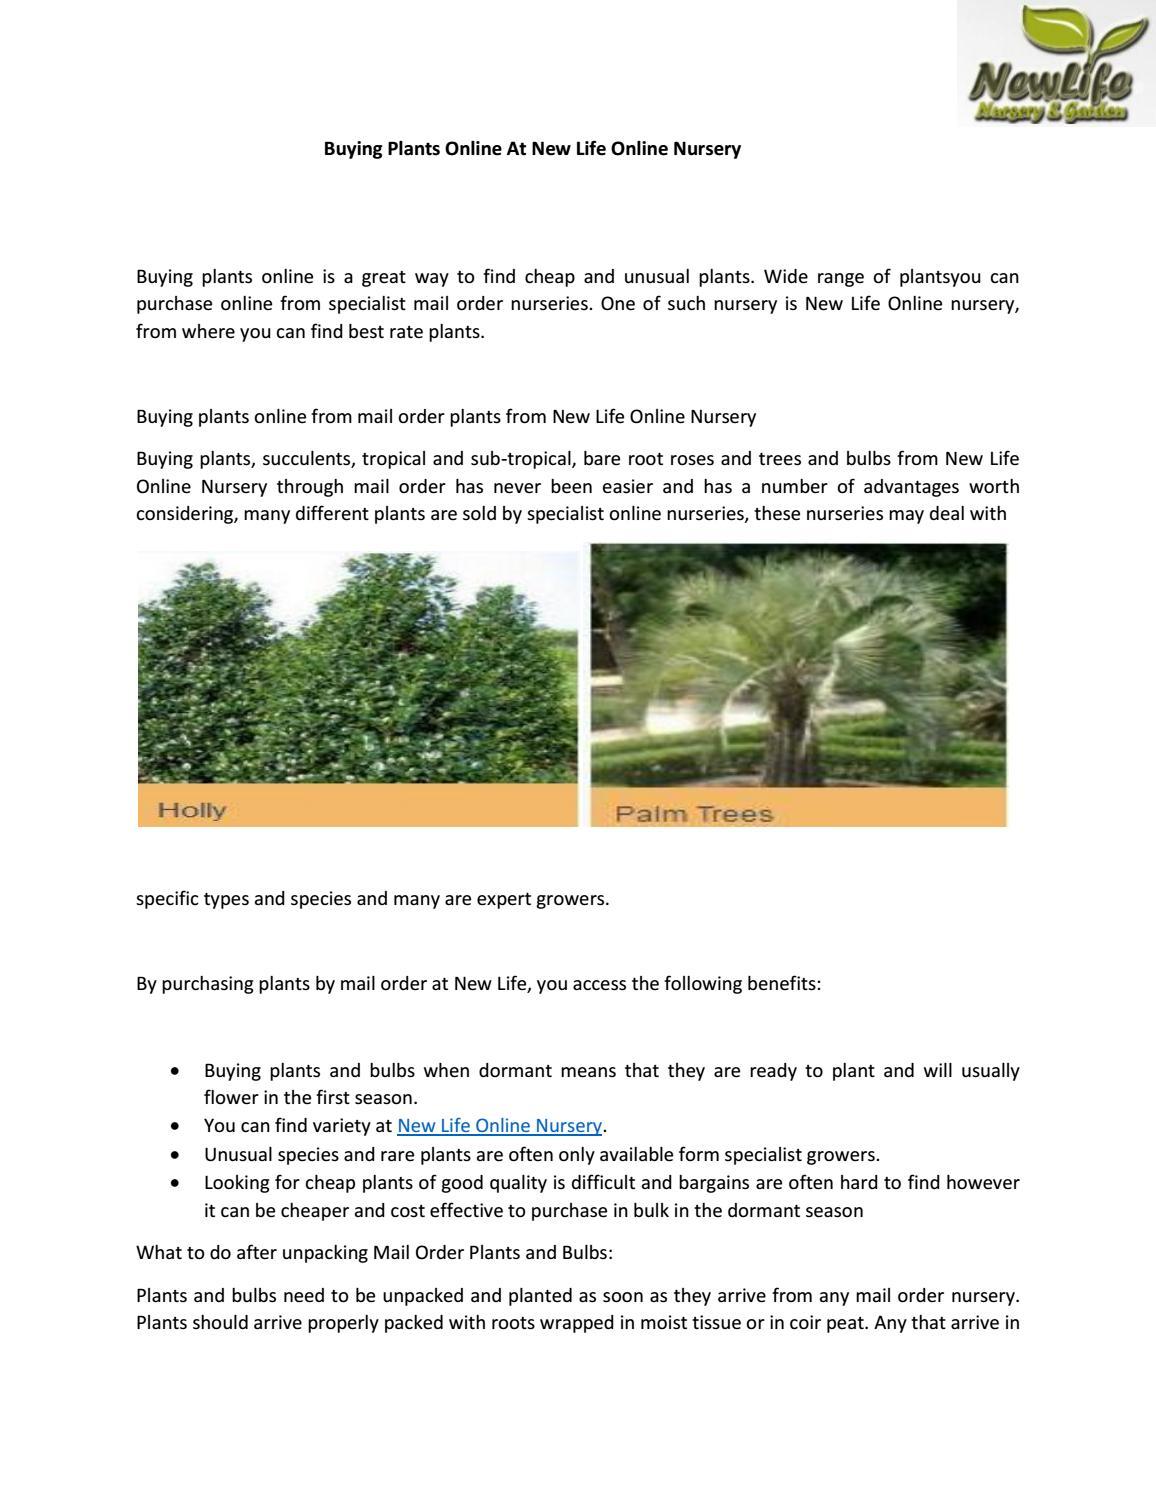 Ing Plants Online At New Life Nursery By Newlifenursery1 Issuu